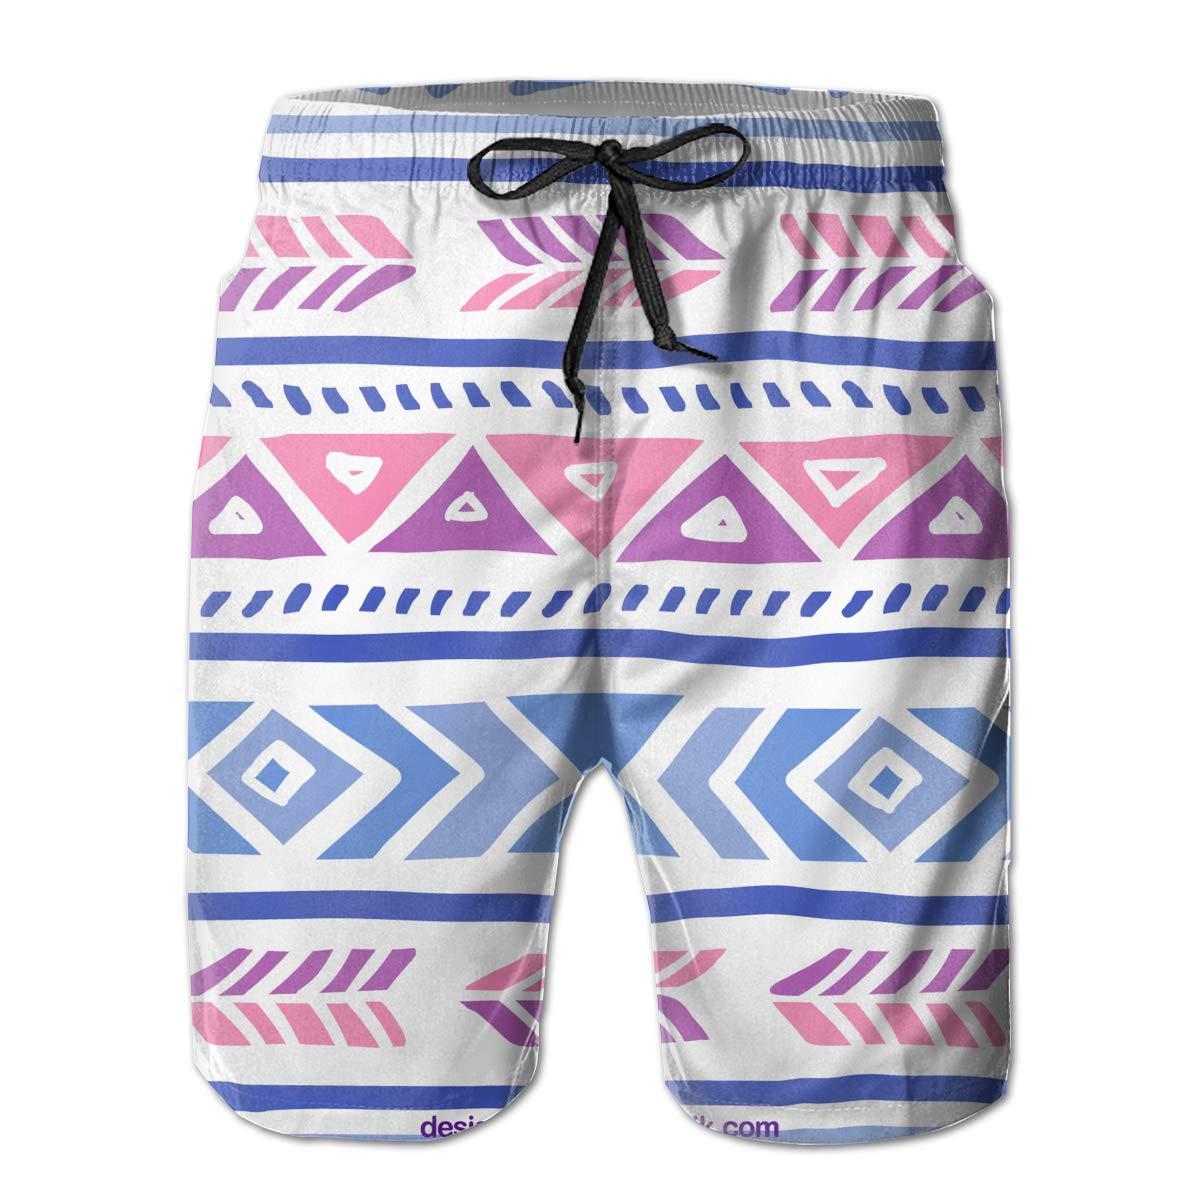 Cl4zyott Geometric Fringes Blue Purple Pink Mens Swim Trunks Quick Dry Beach Shorts Board Shorts